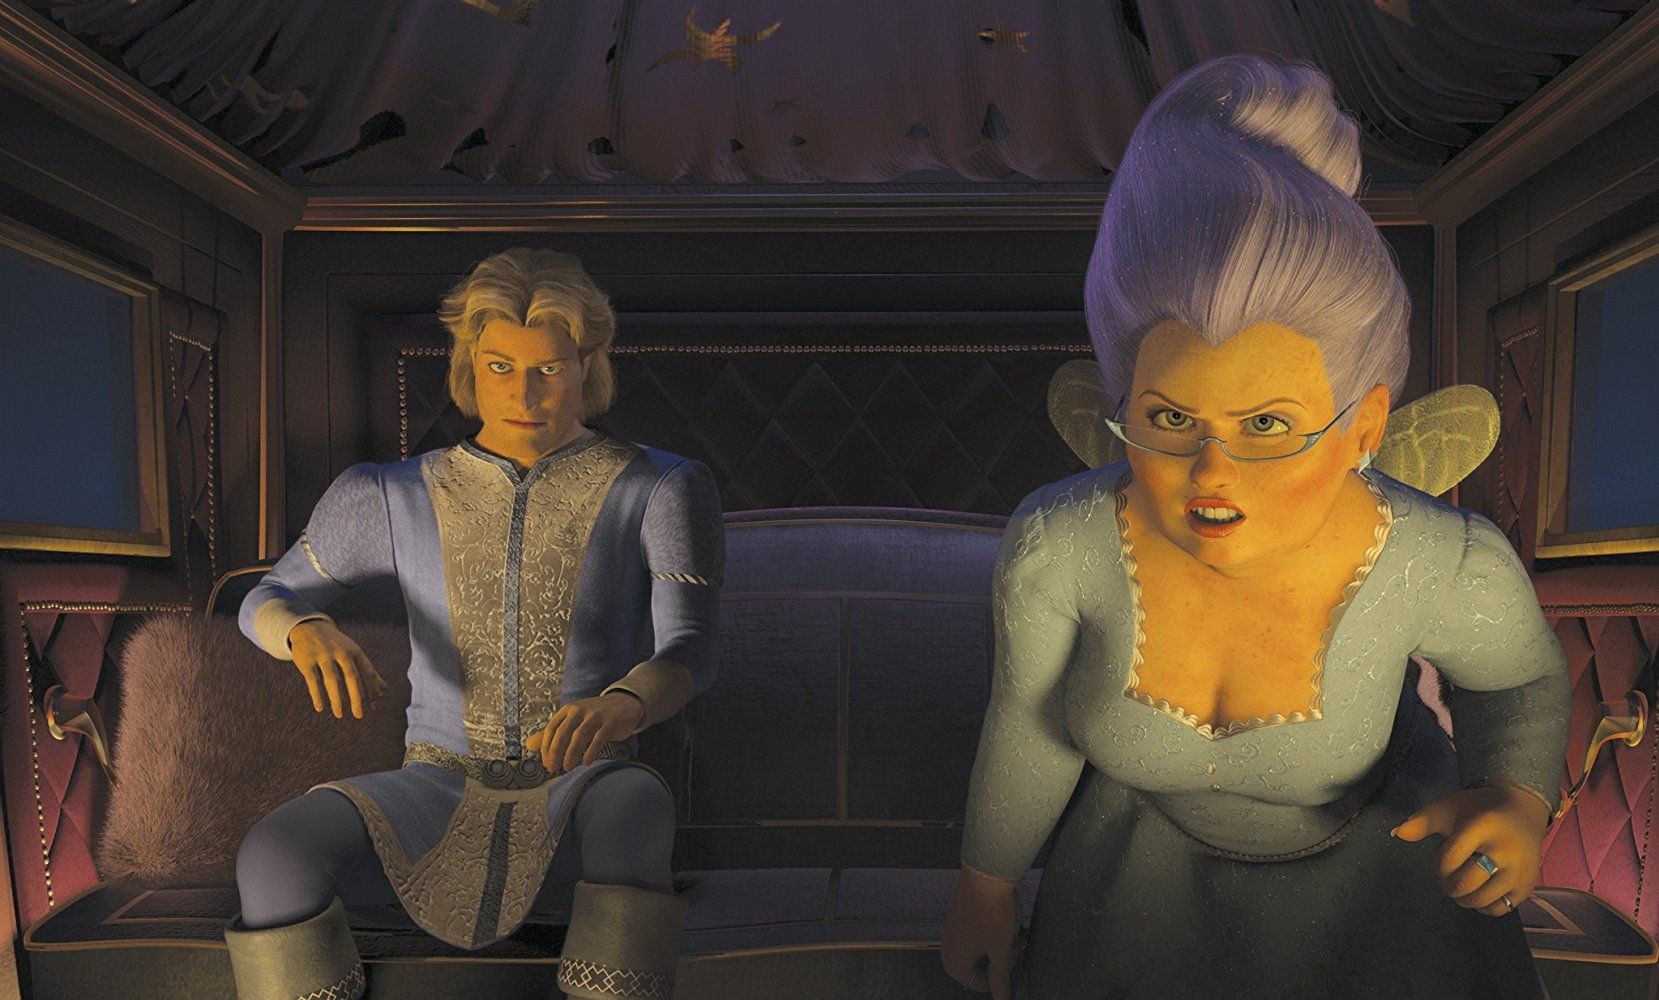 Prince Charming Rupert Everett And The Fairy Godmother Jennifer